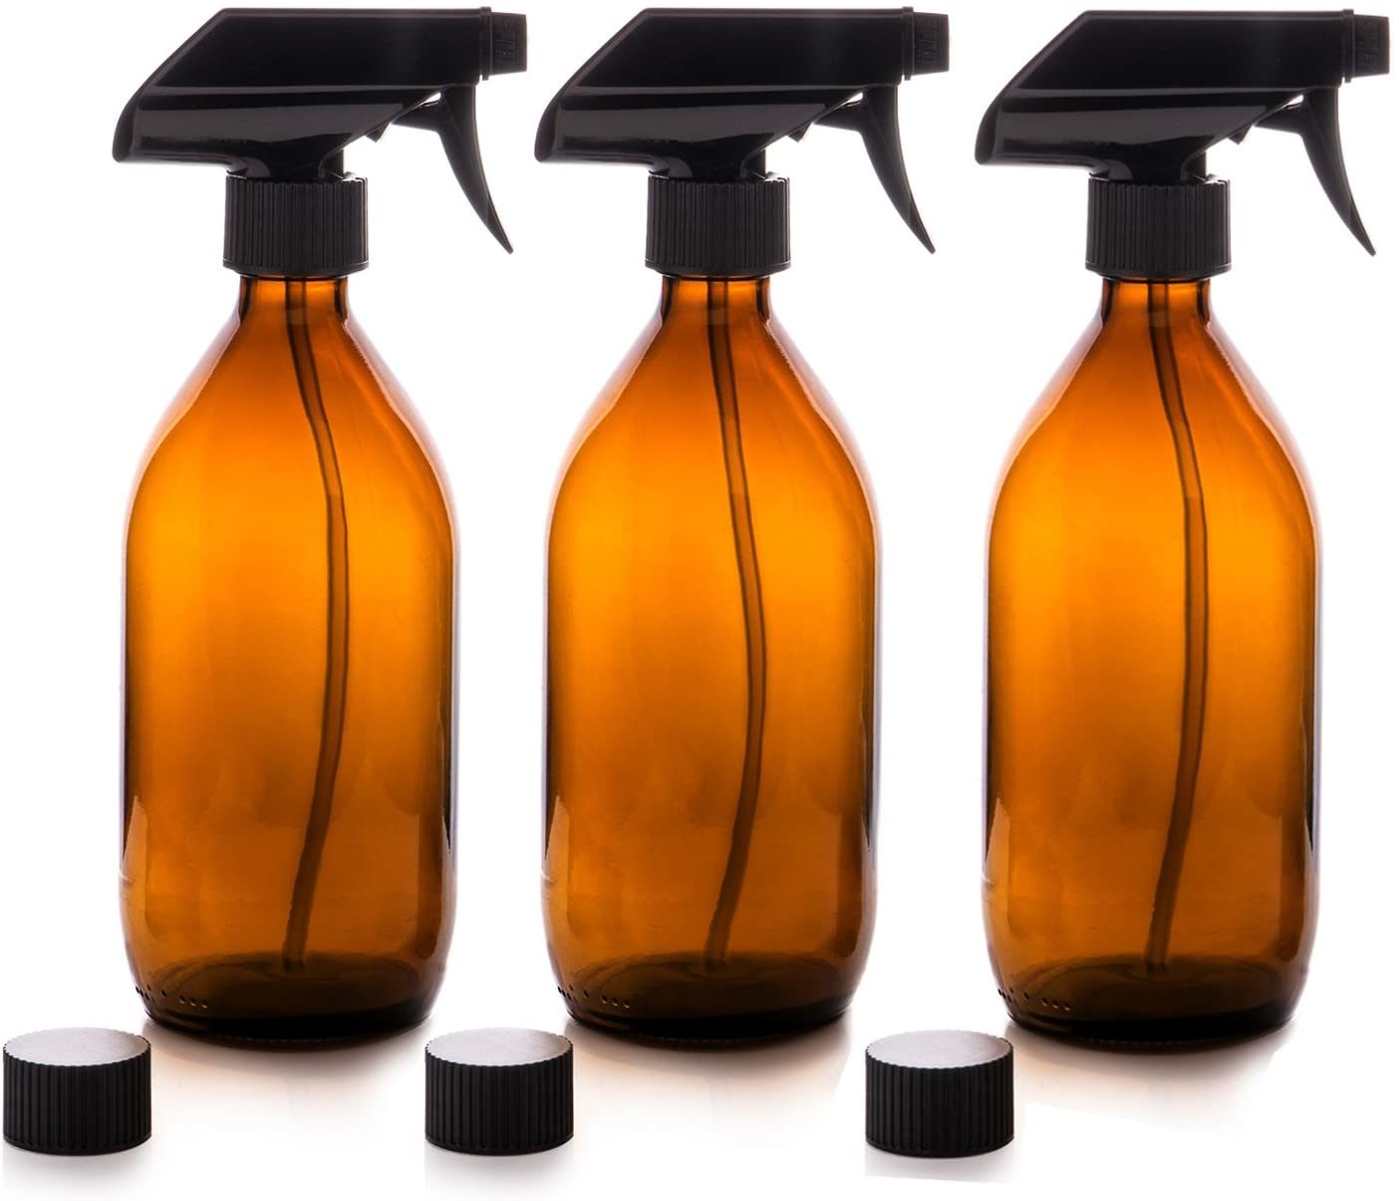 Nomara Organics Vaporizador en Botella de Cristal Ámbar Set 500 mL. Reutlizable / Eco-friendly / Orgánico / Limpieza / Plantas / Cabello / Bricolaje (3 x 500mL)